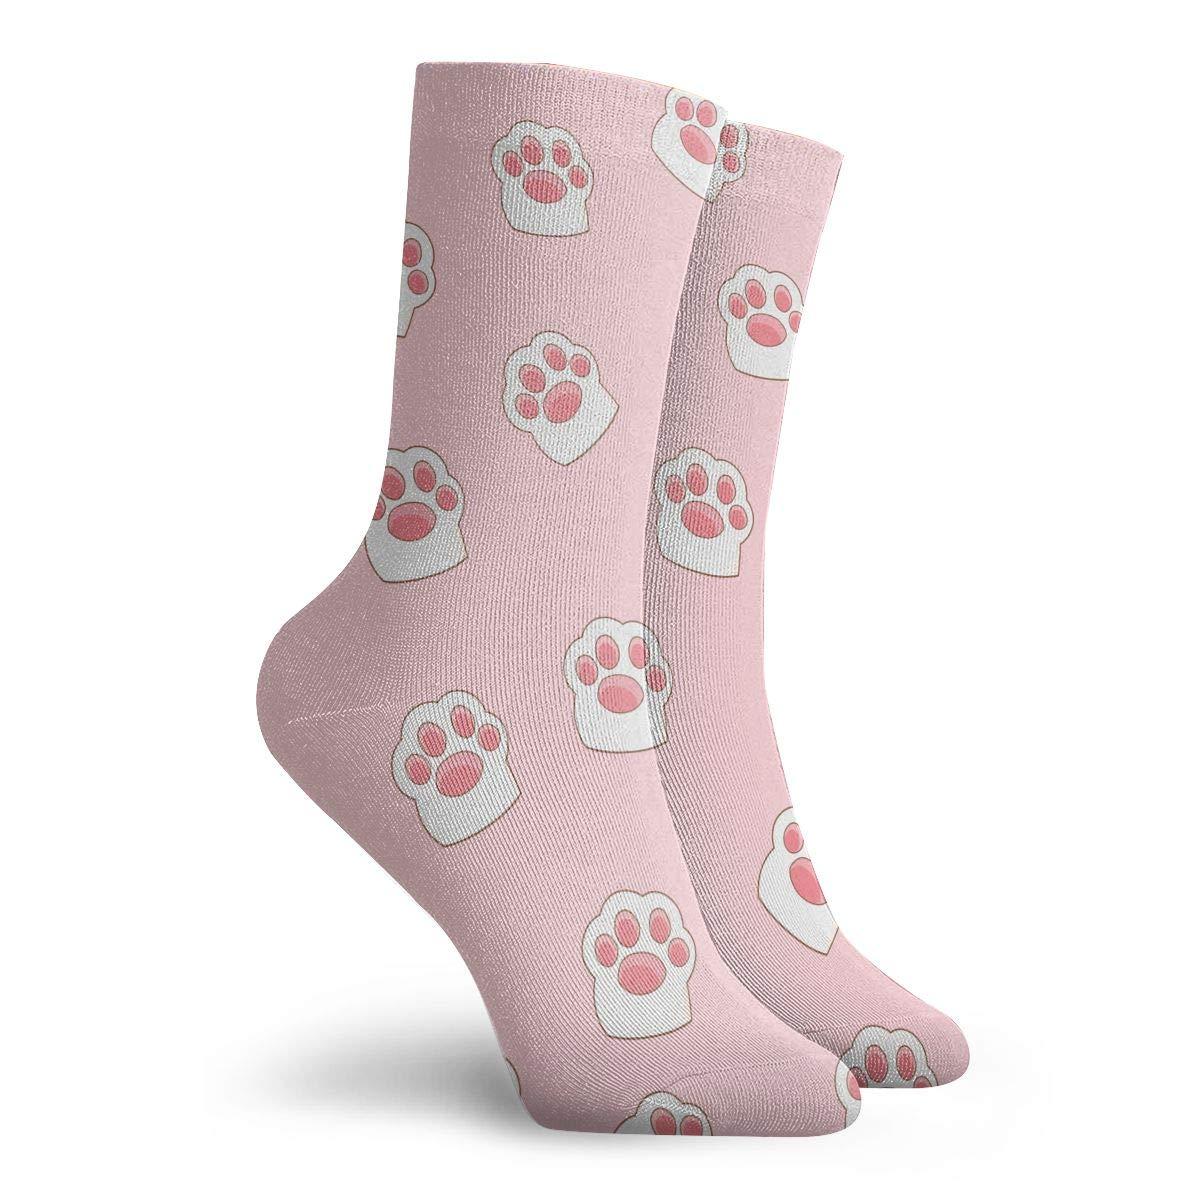 Cat Frootprint Unisex Funny Casual Crew Socks Athletic Socks For Boys Girls Kids Teenagers